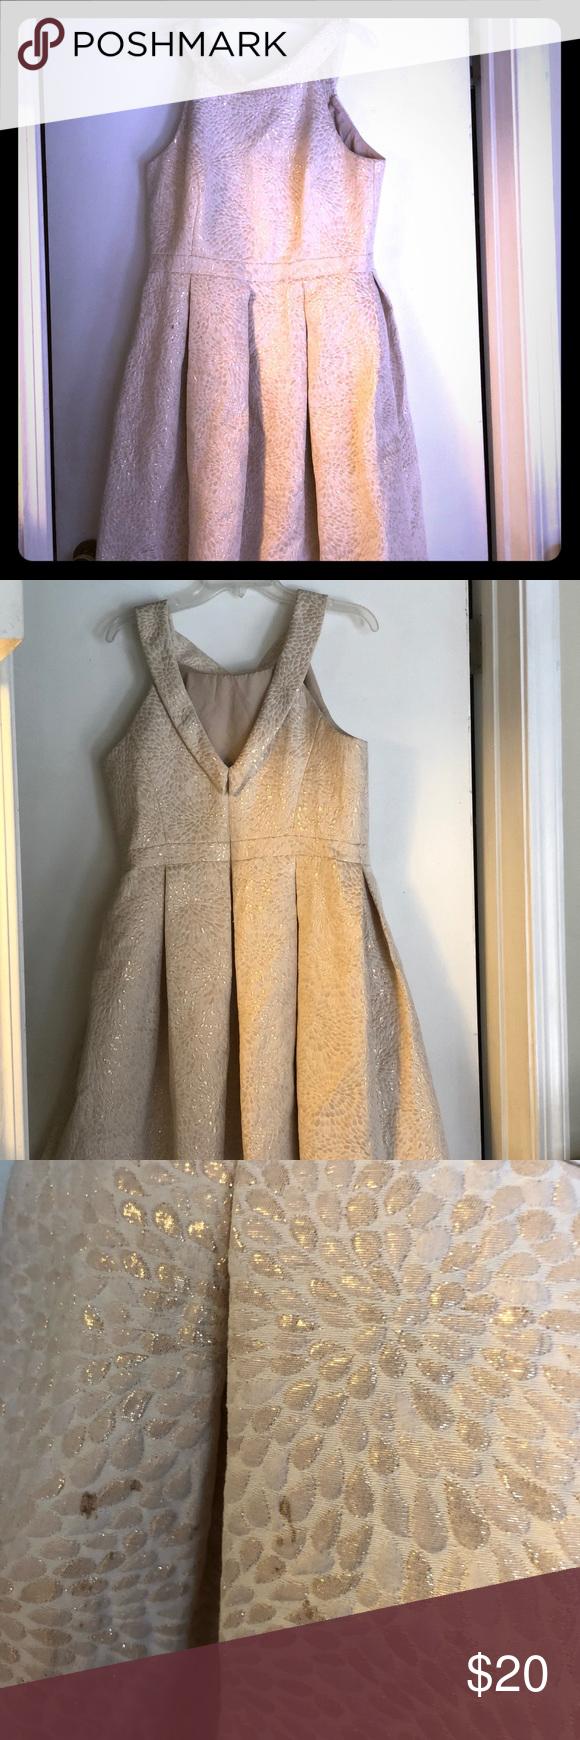 Cream colored vintage wedding dresses  Vintage Davidus Bridal  My Posh Closet  Pinterest  Davids bridal